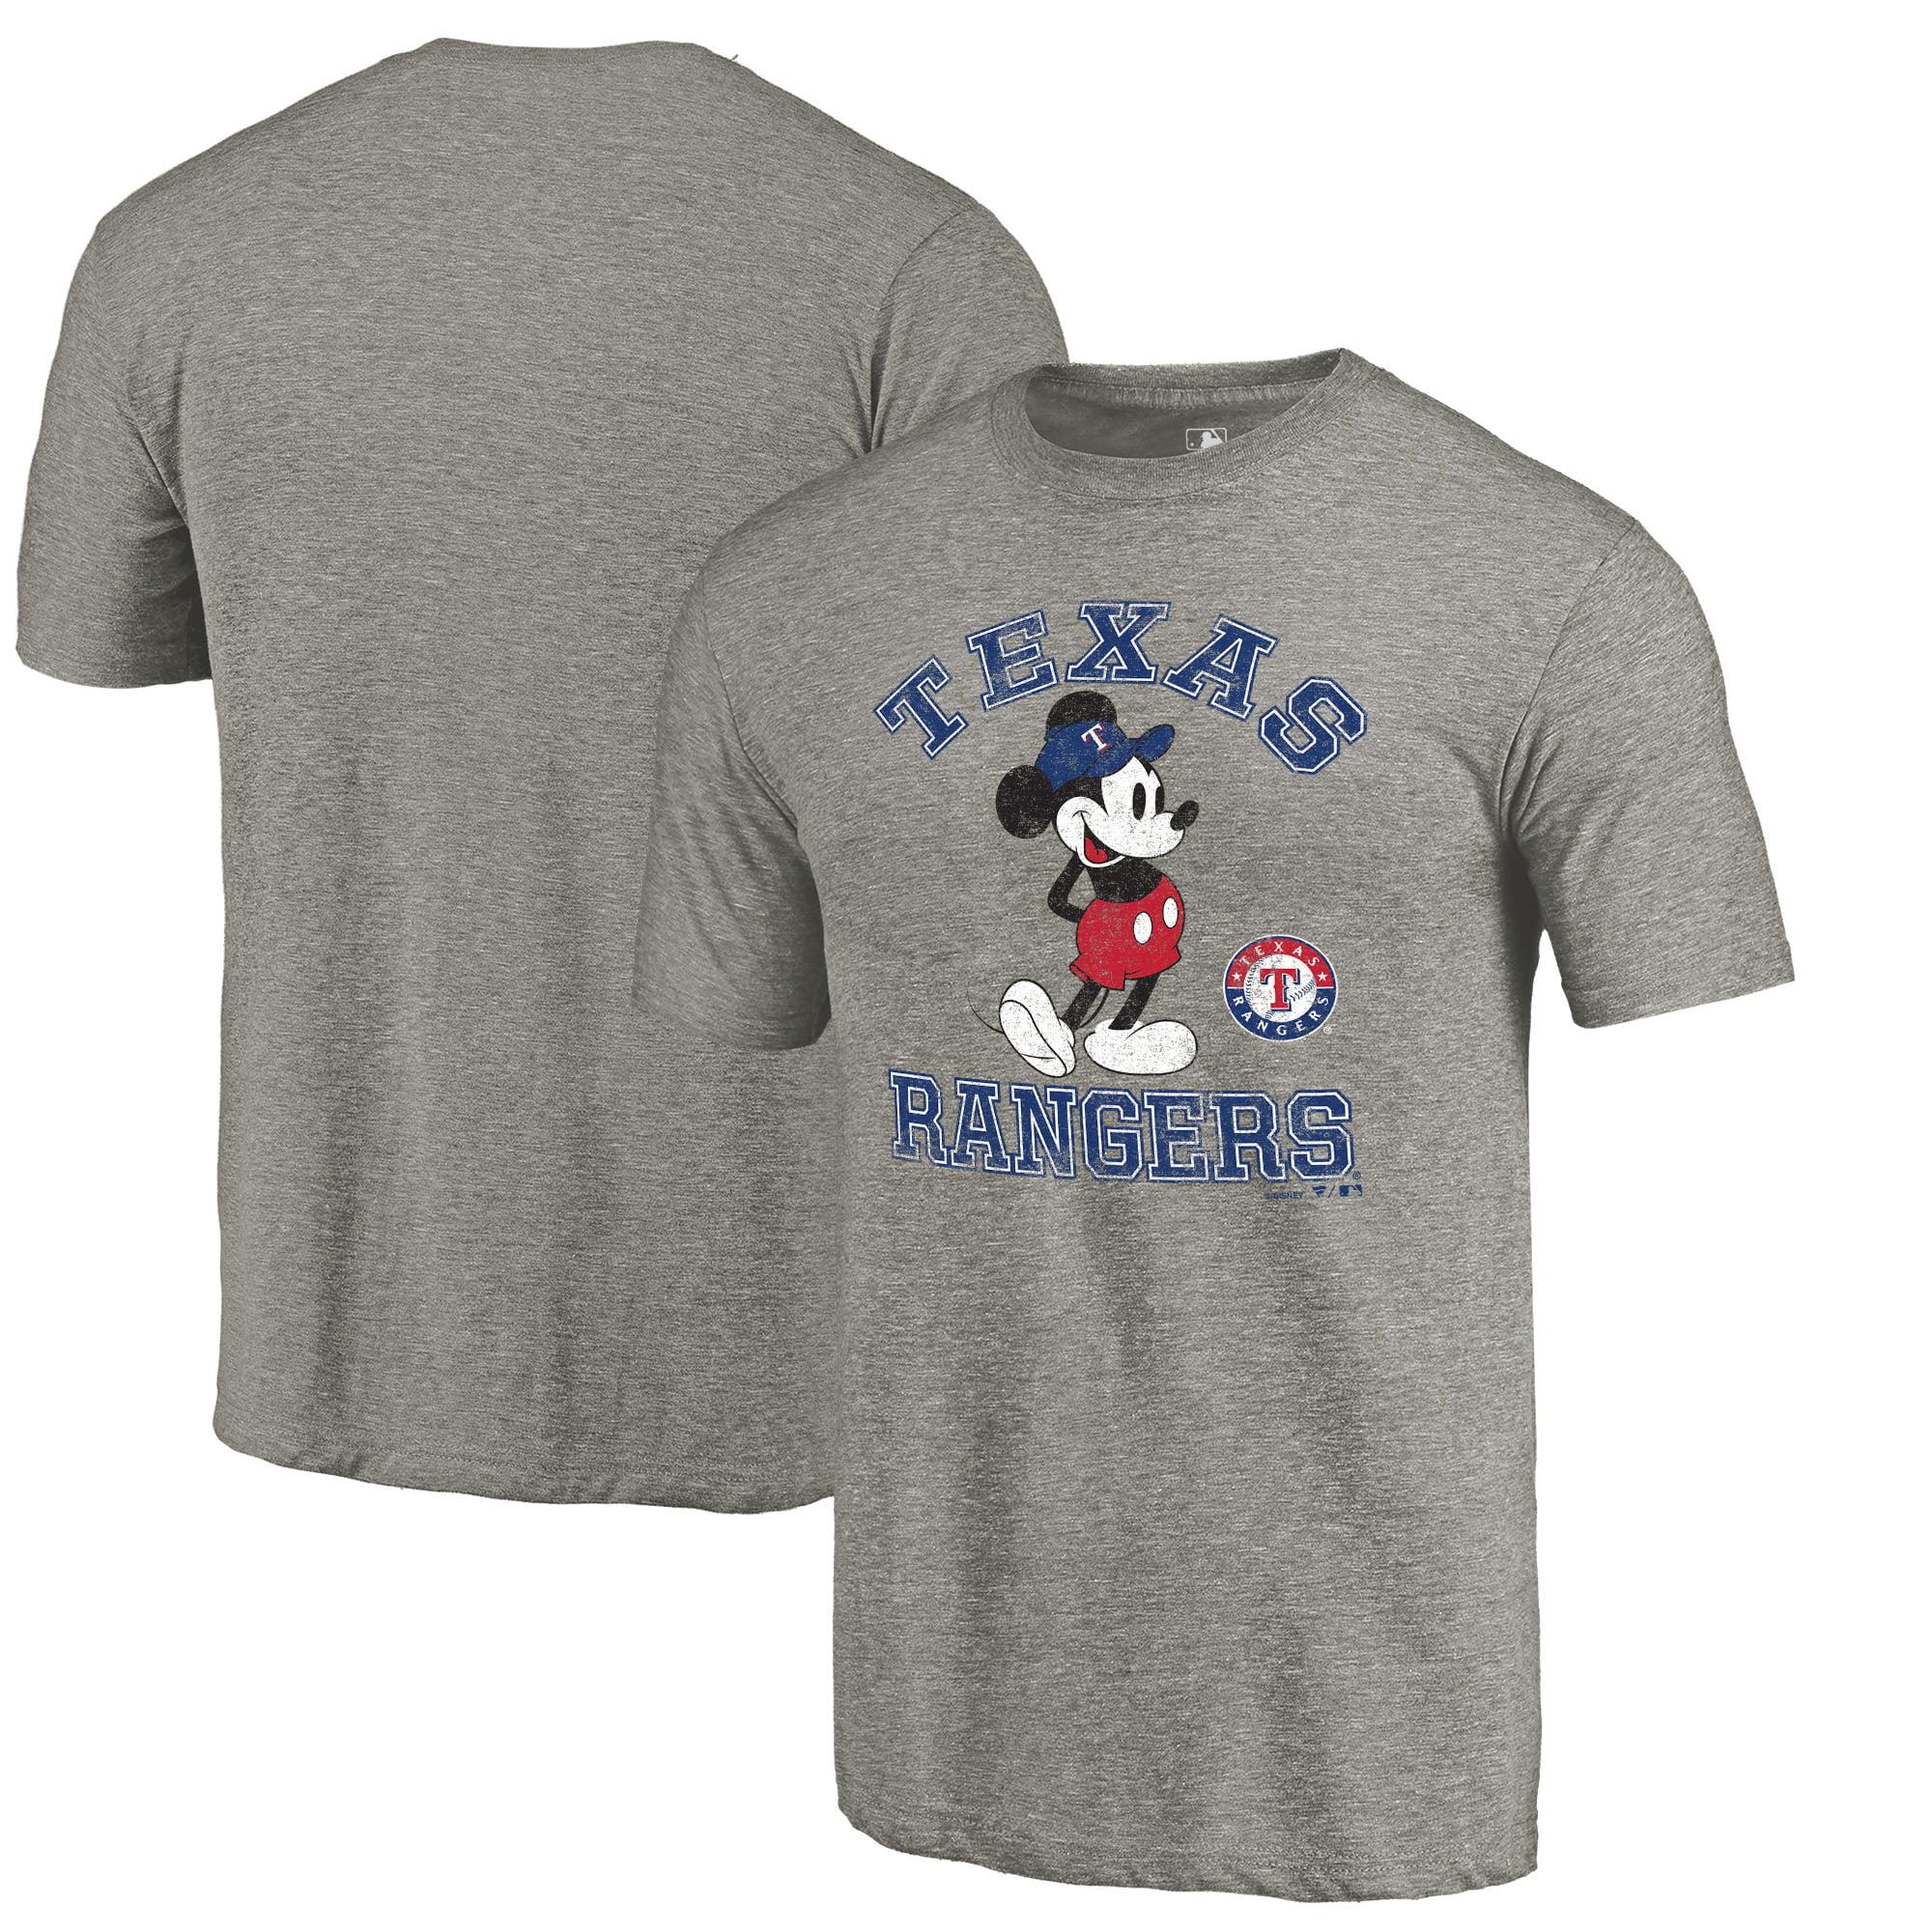 Texas Rangers Fanatics Branded Disney MLB Tradition Tri-Blend T-Shirt - Heathered Gray